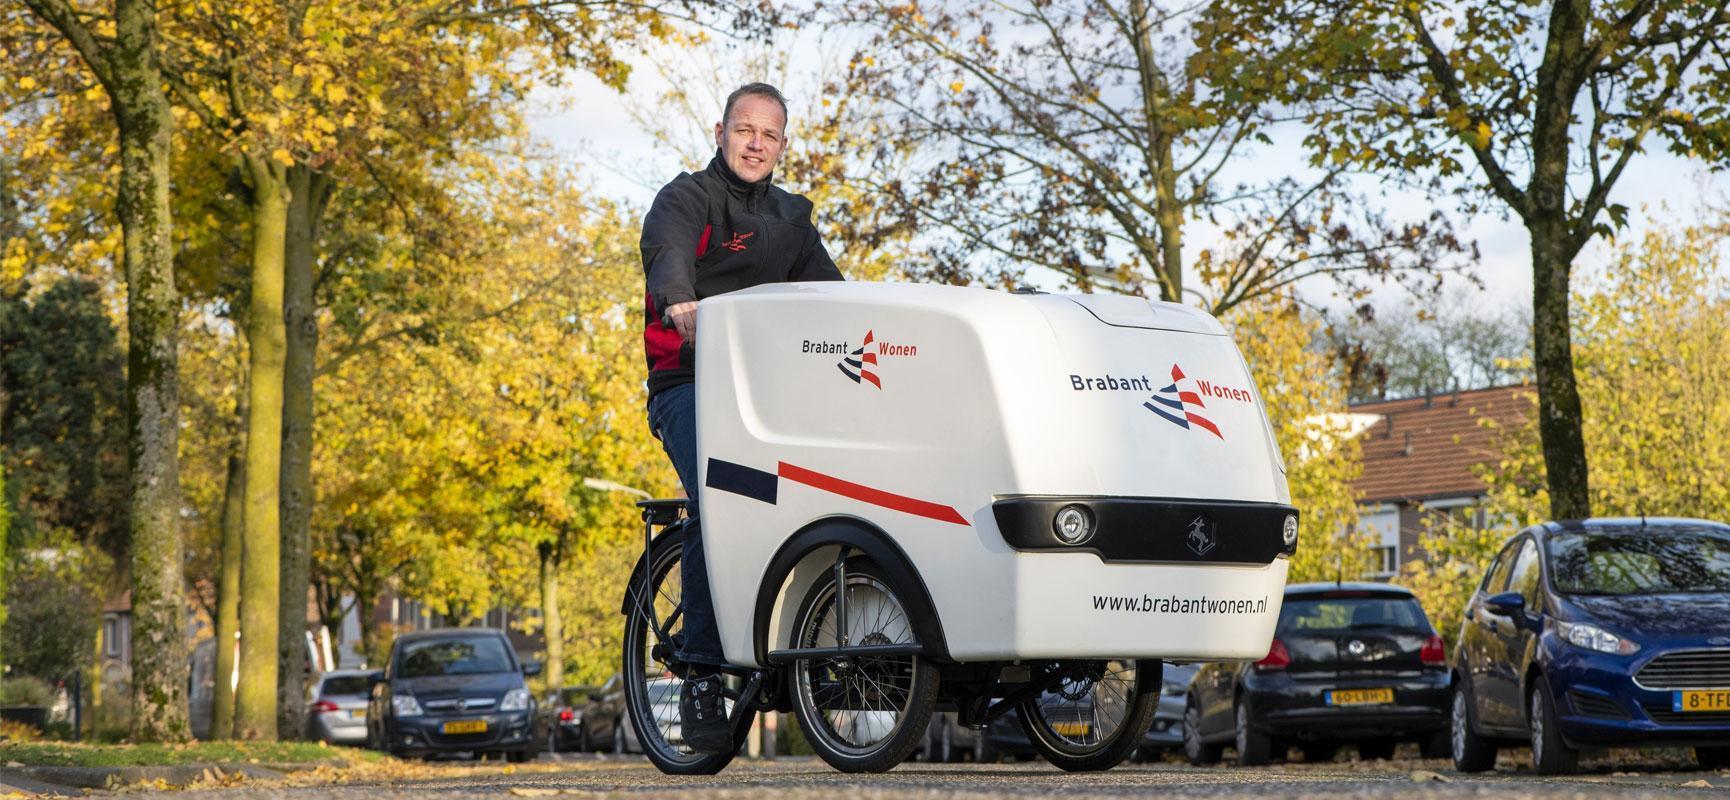 The BrabantWonen electric service bike